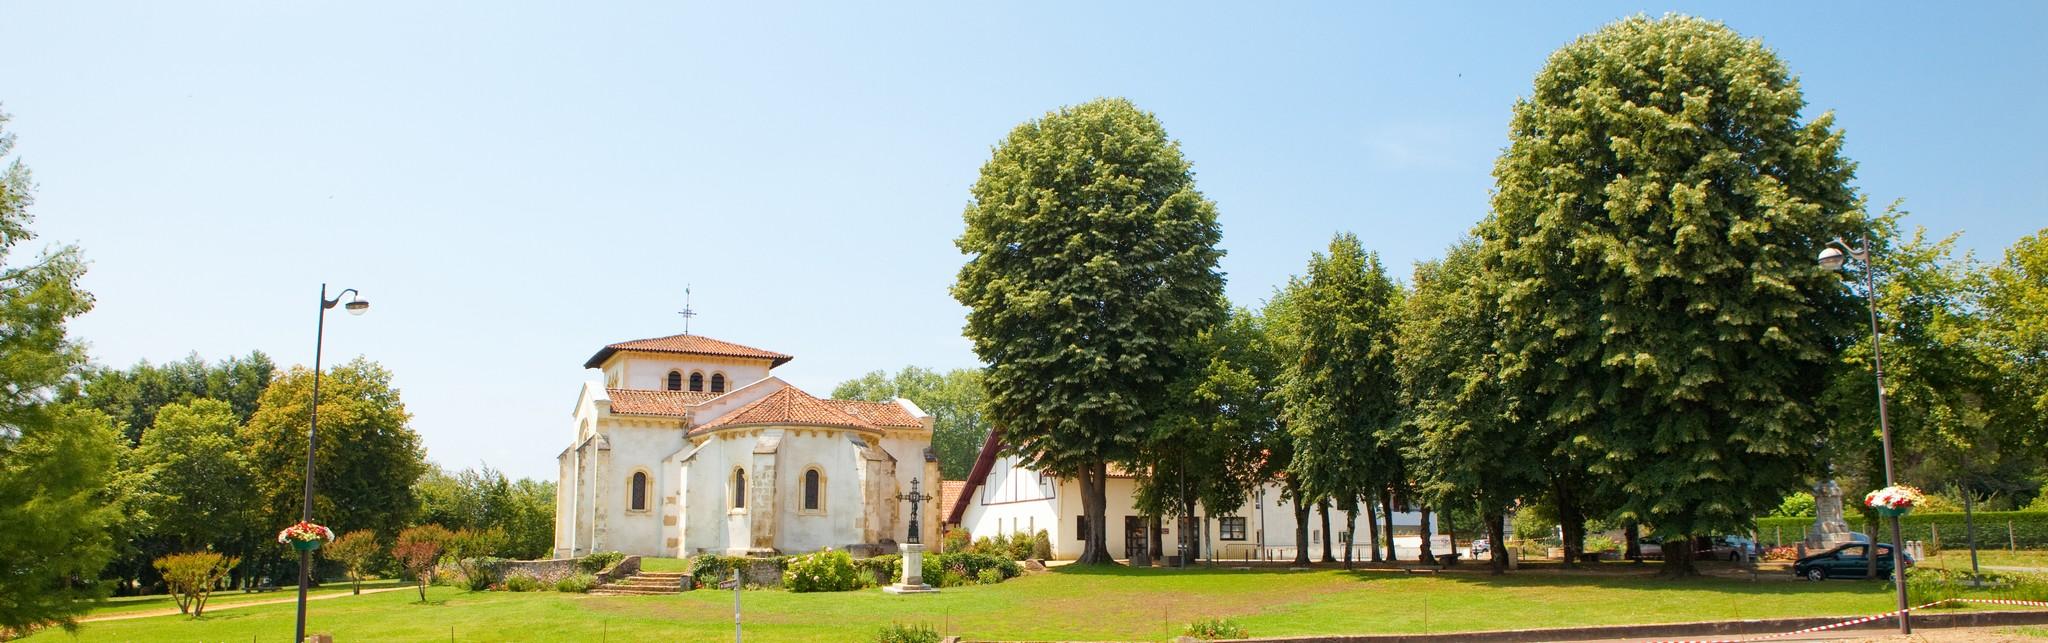 Patrimoine-Tosse-Eglise